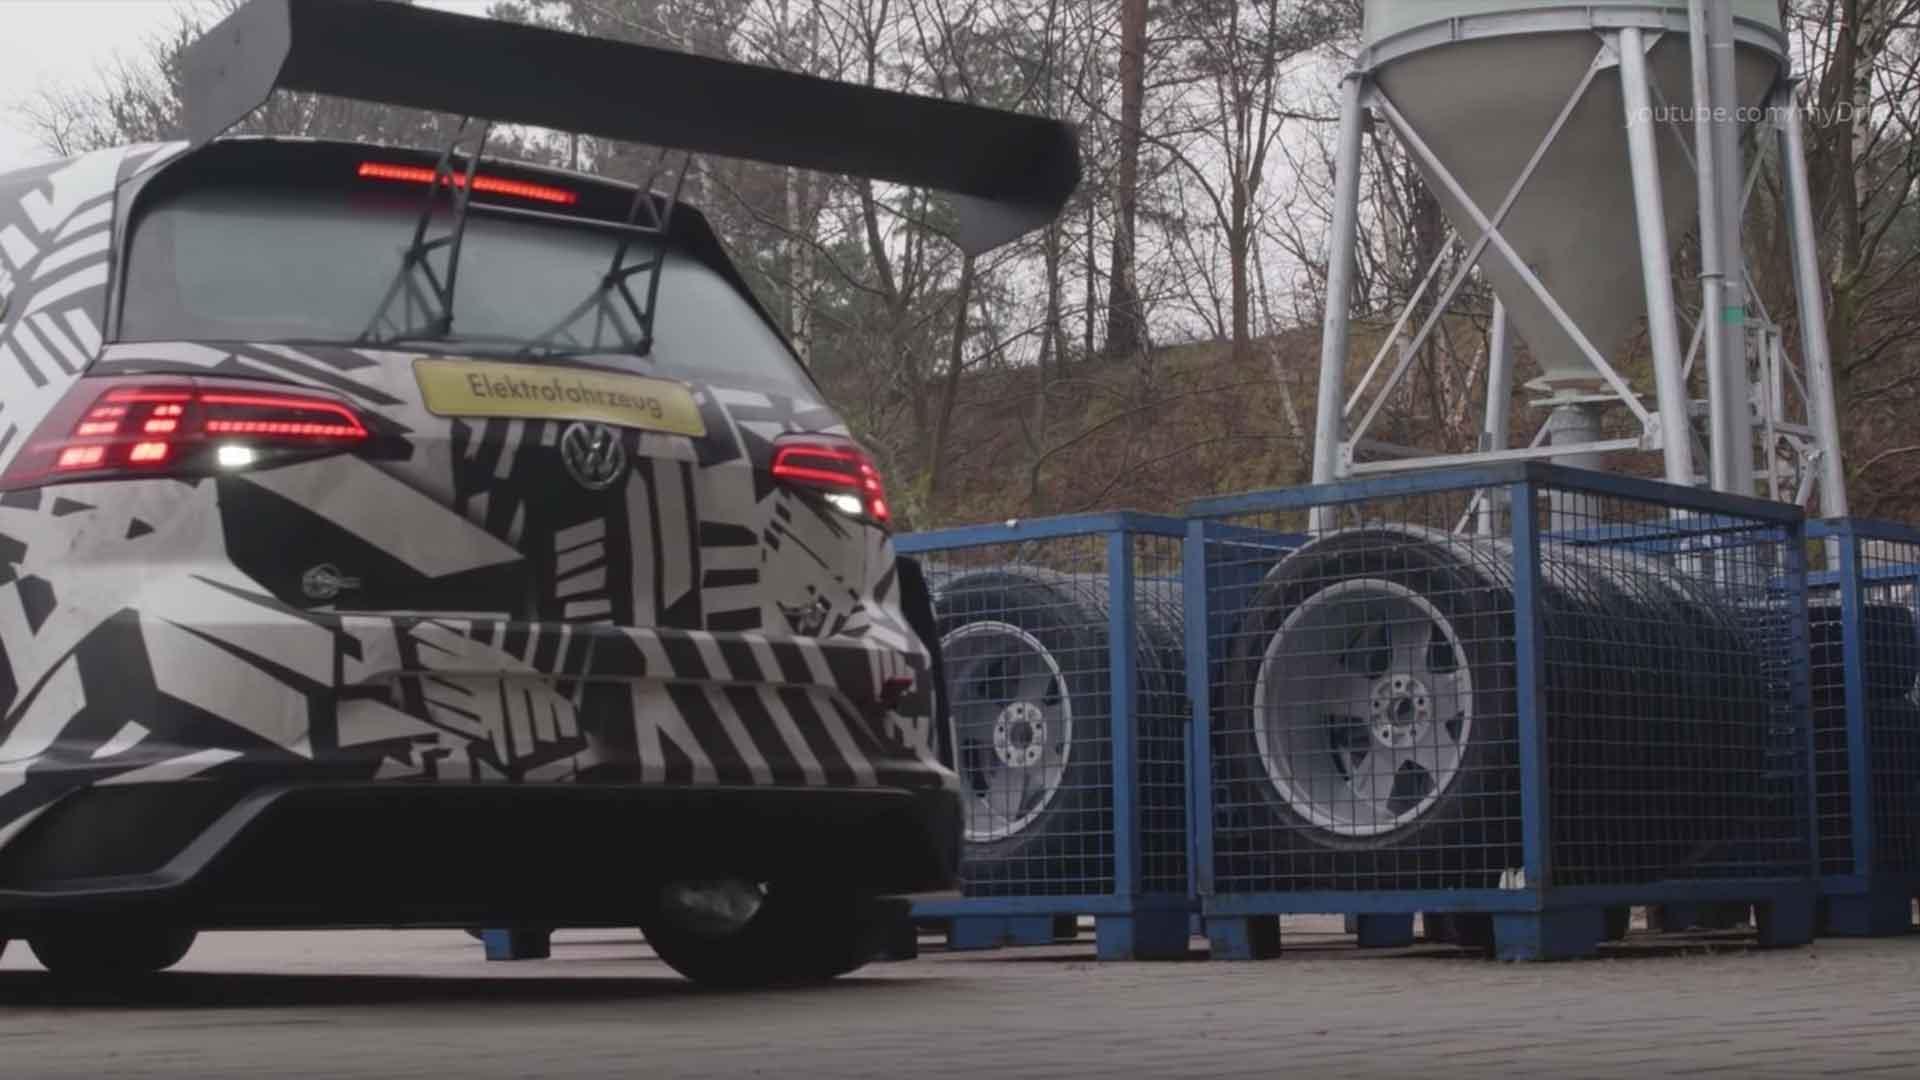 volkswagen-gti-tcr-idr-electric-prototype-3